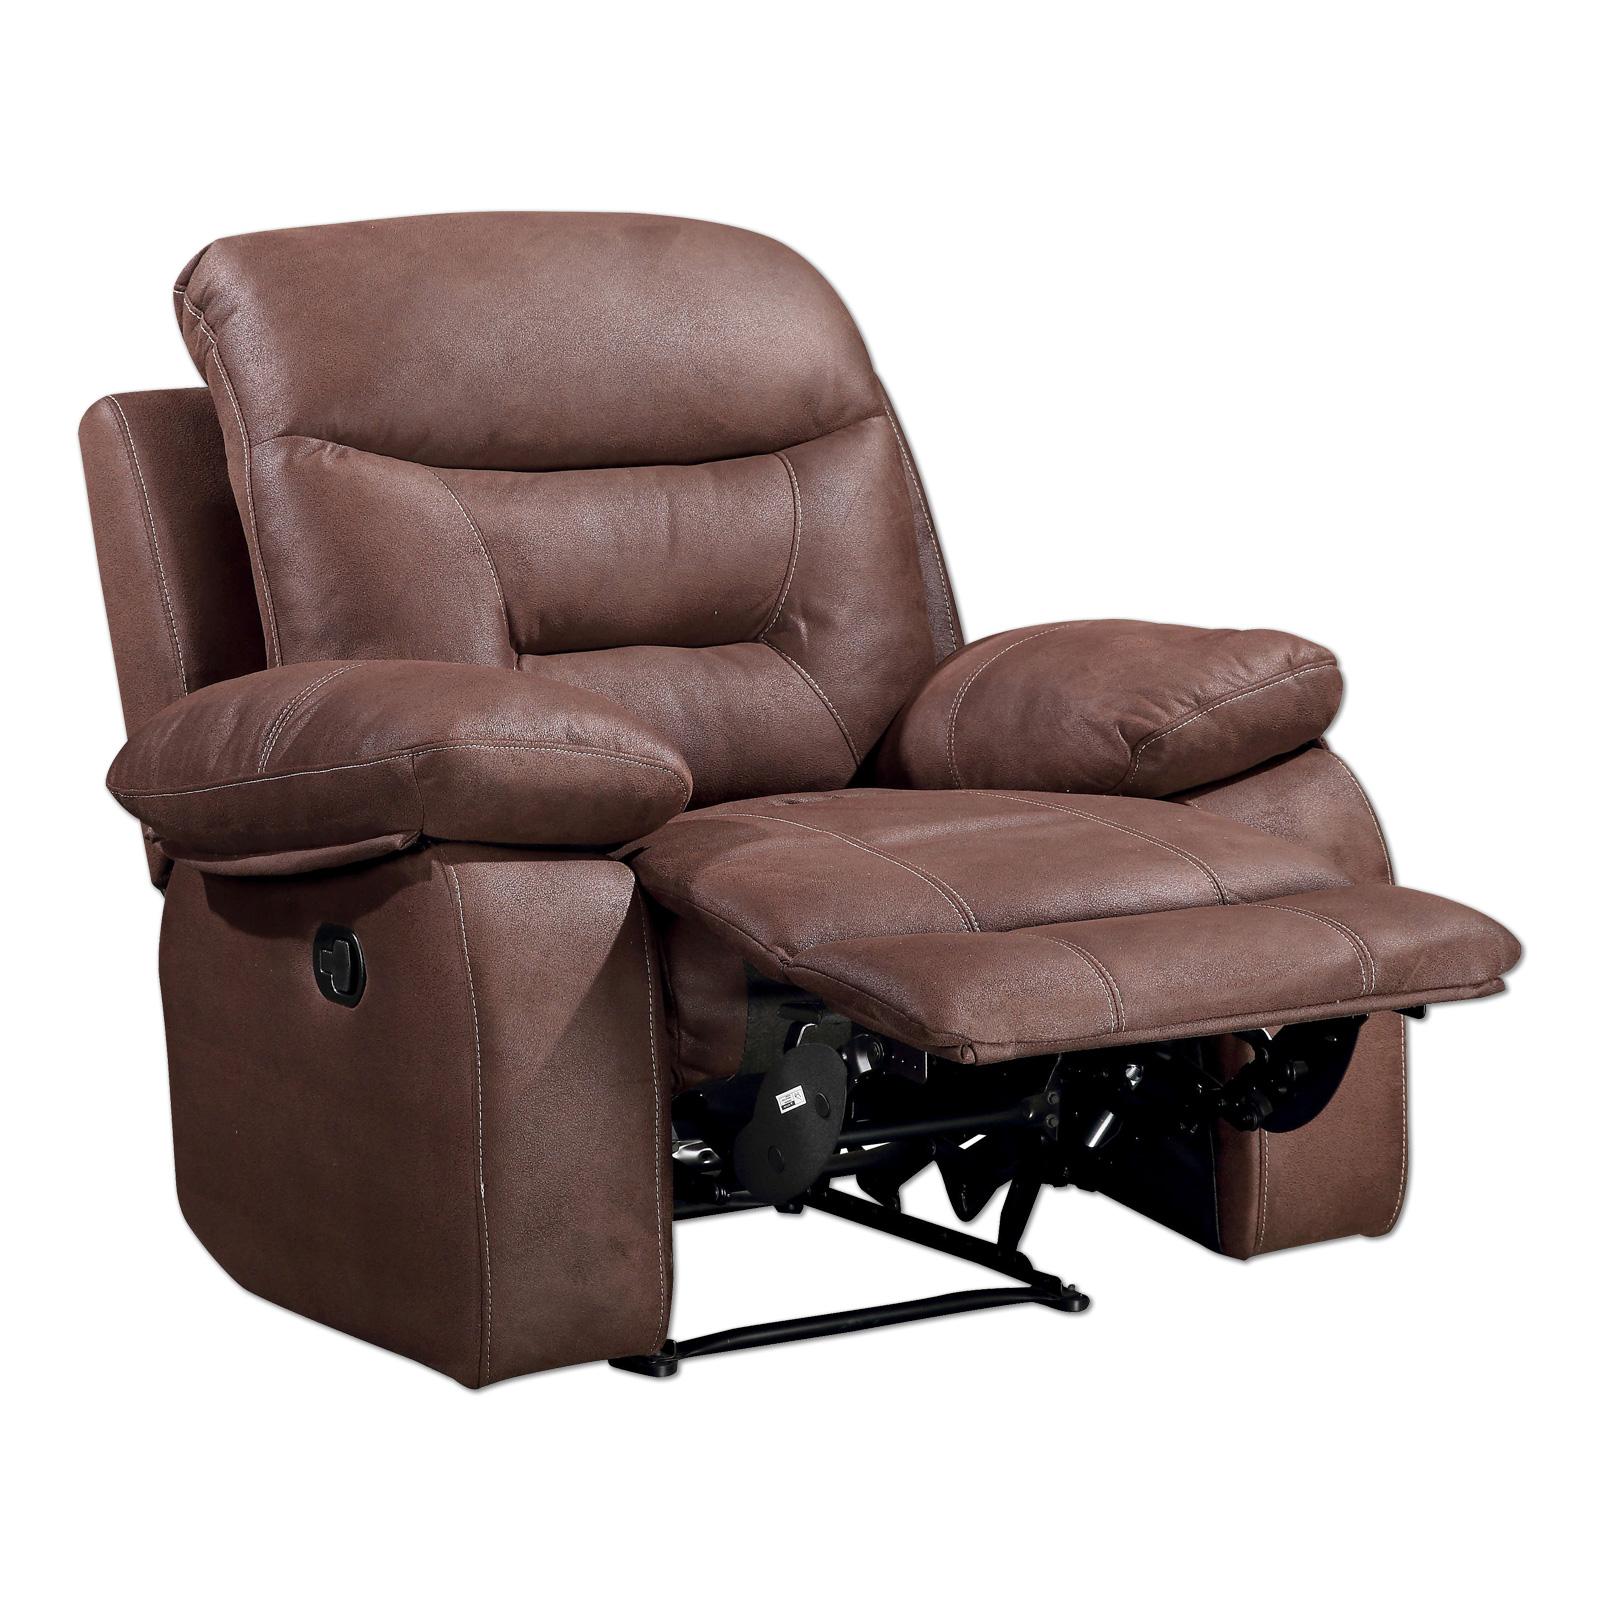 Sessel dunkelbraun mit Relaxfunktion